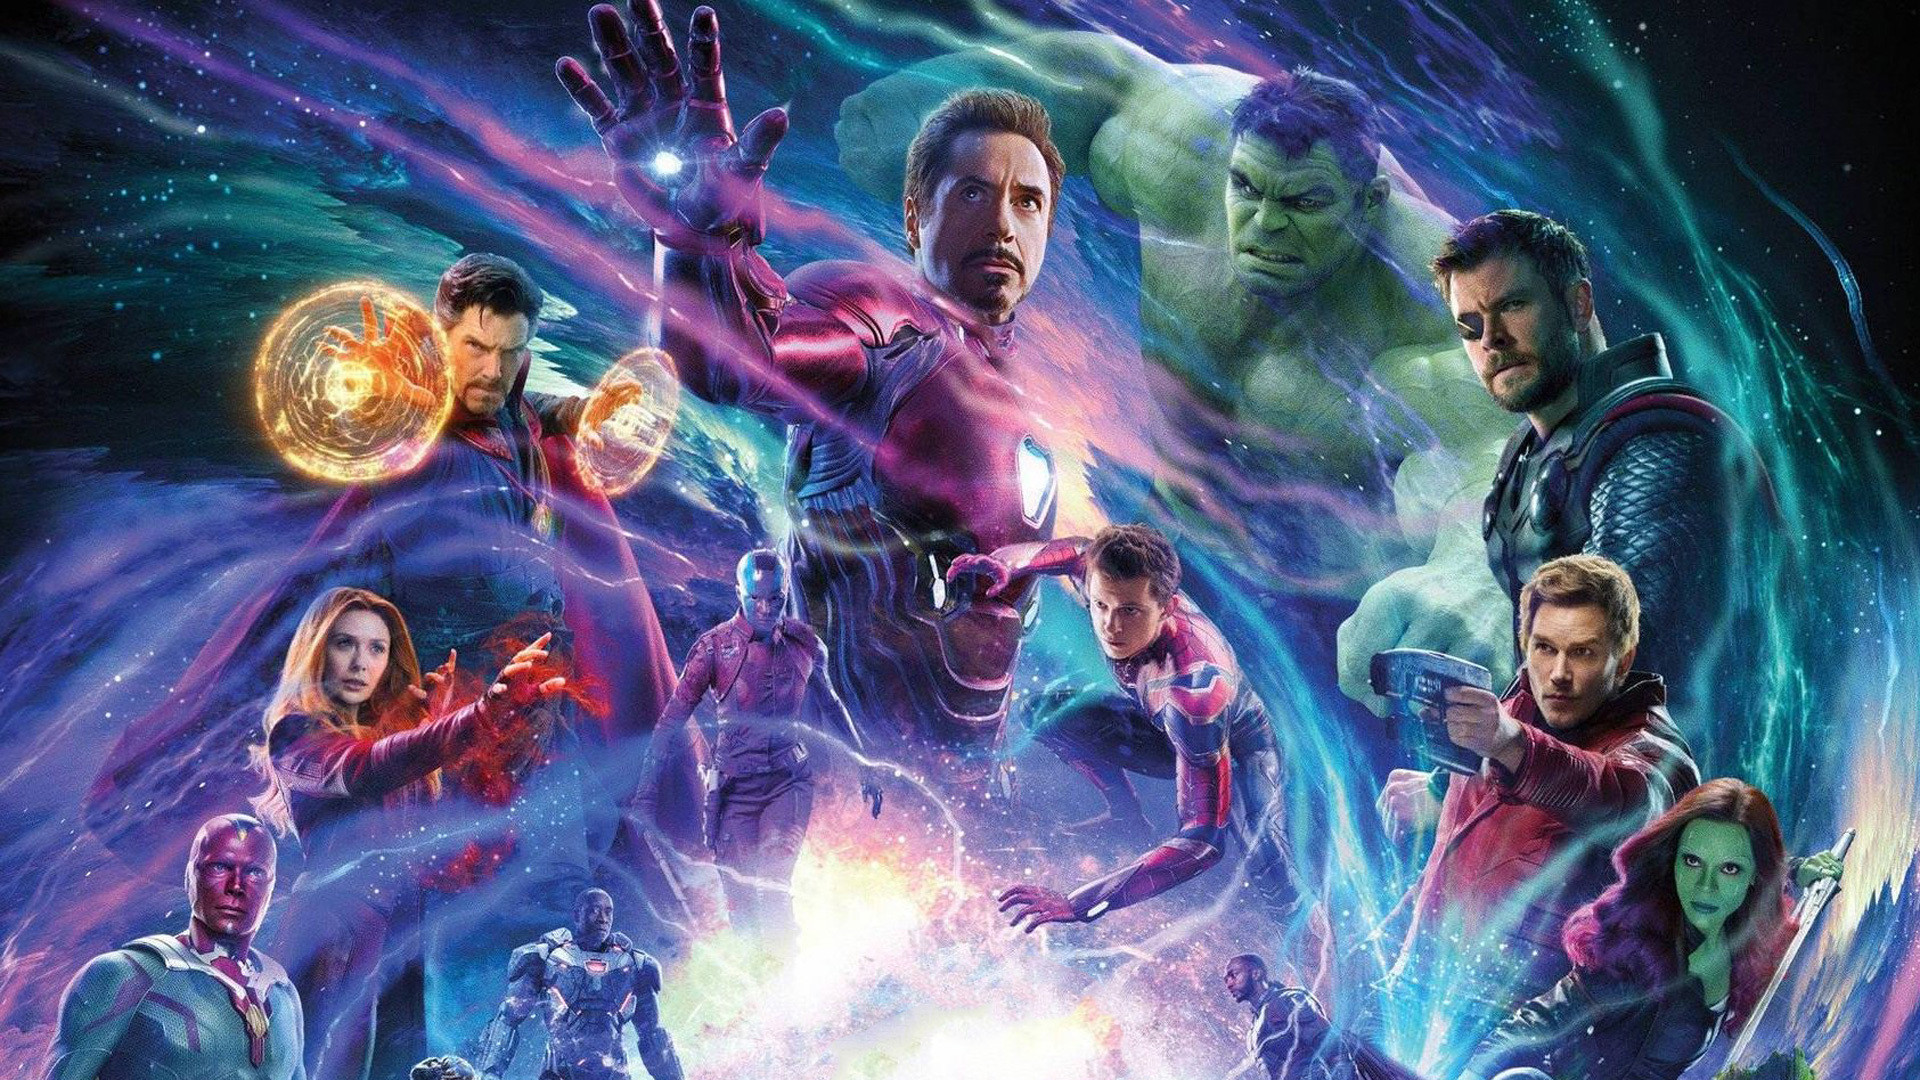 1920x1080 Avengers Infinity War Movie Bill Poster Laptop ...